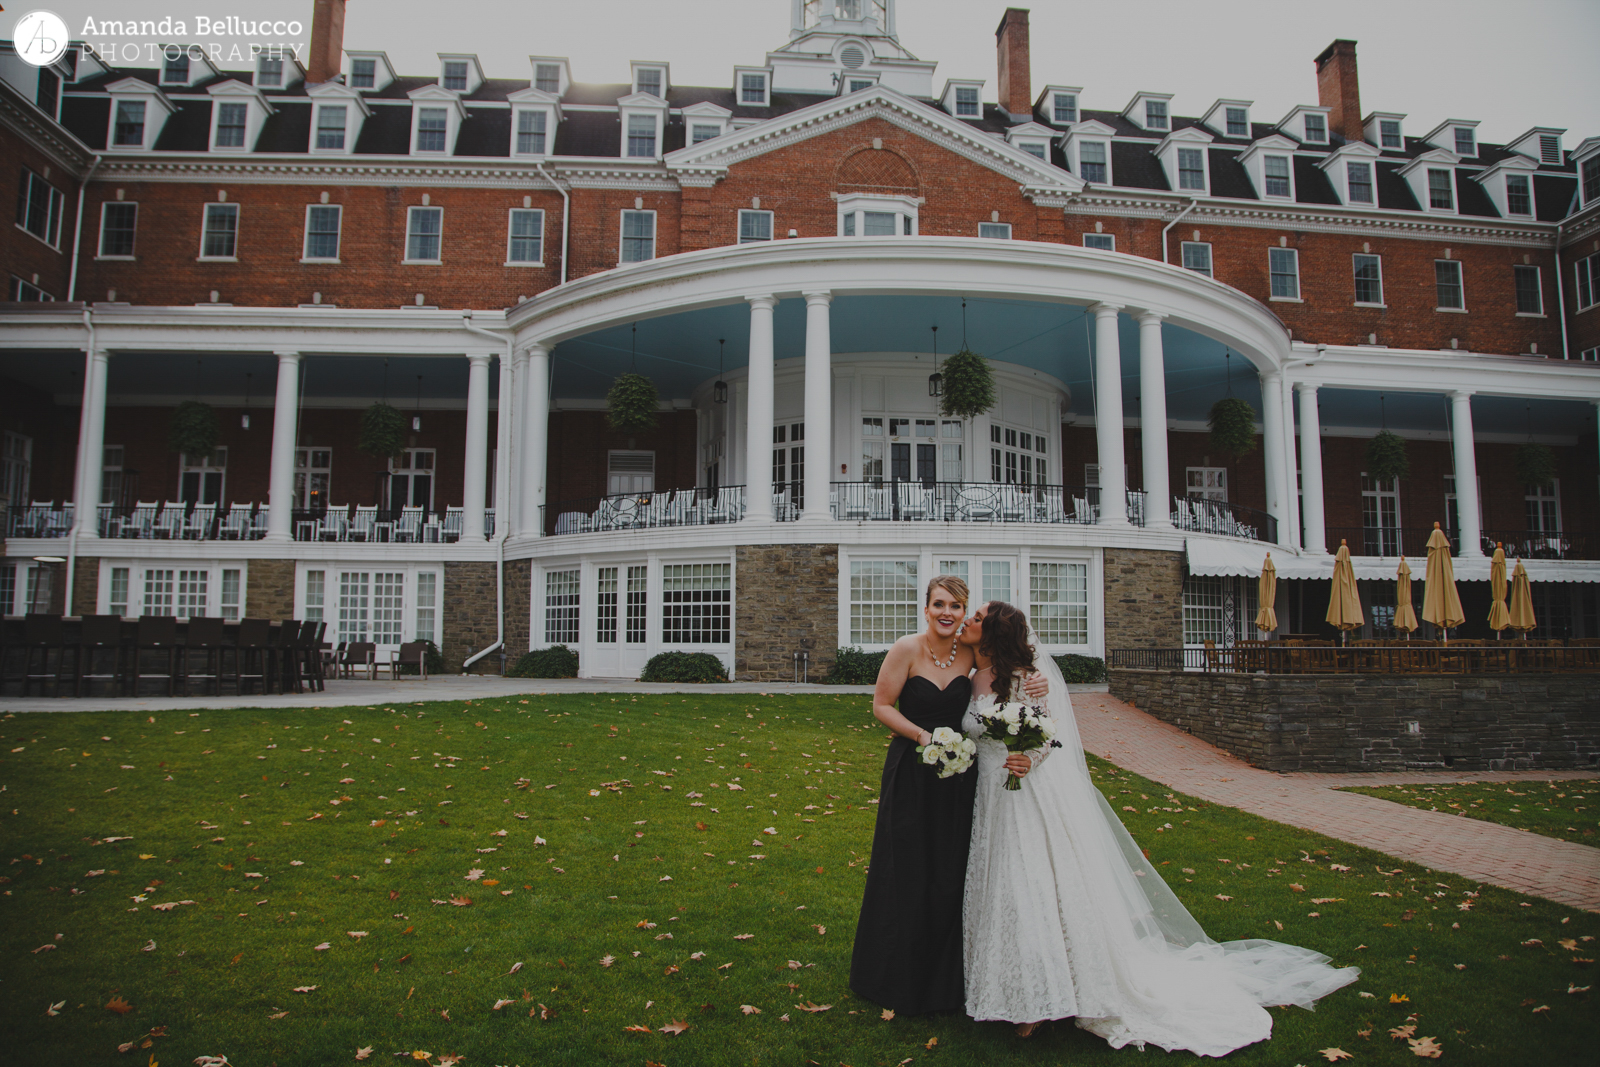 syracuse-rochester-fine-art-wedding-photographer-63.JPG